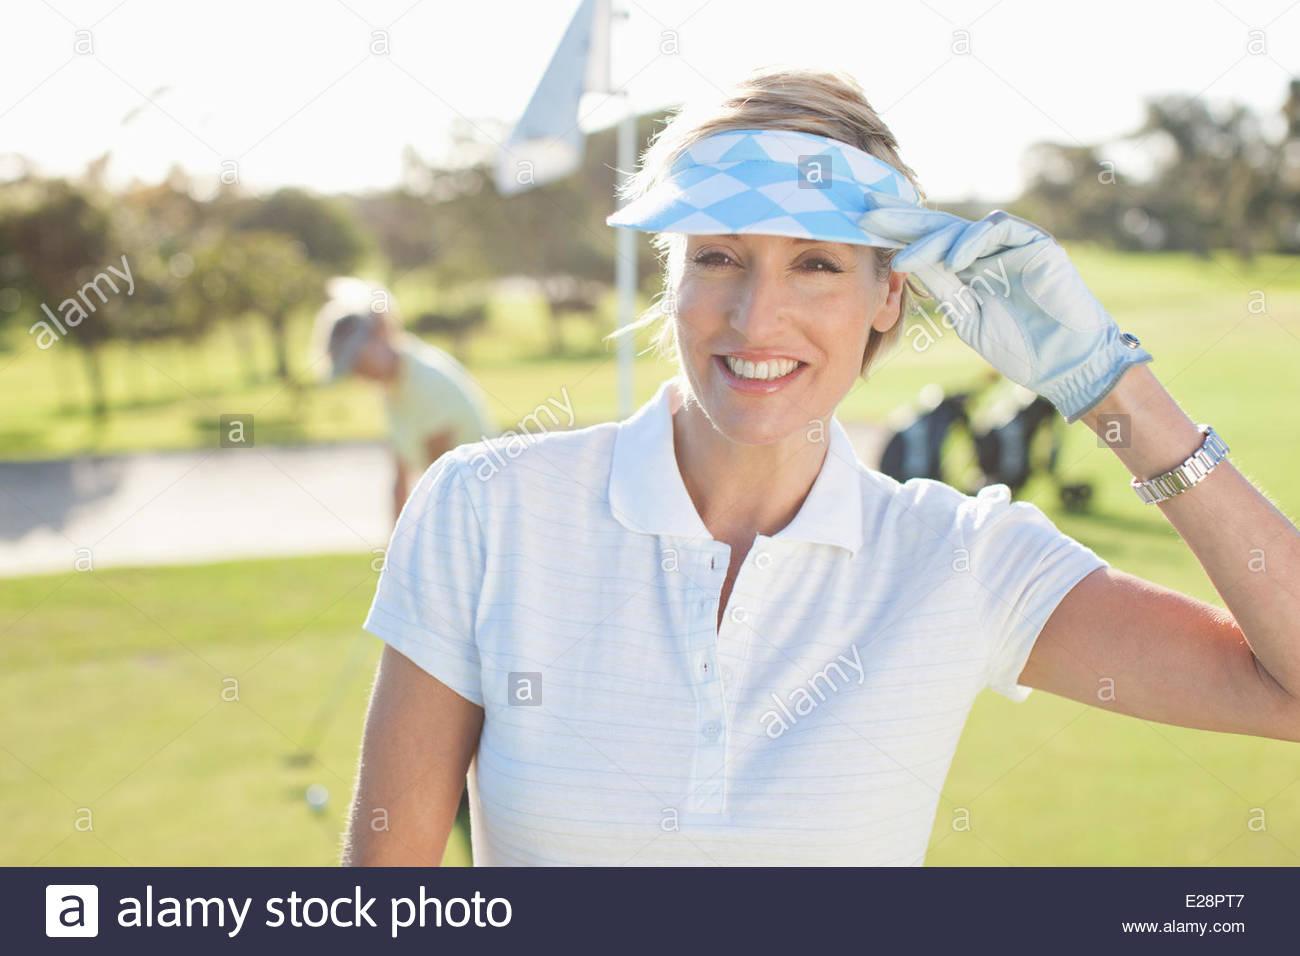 Frau stehend auf Golfplatz Stockbild